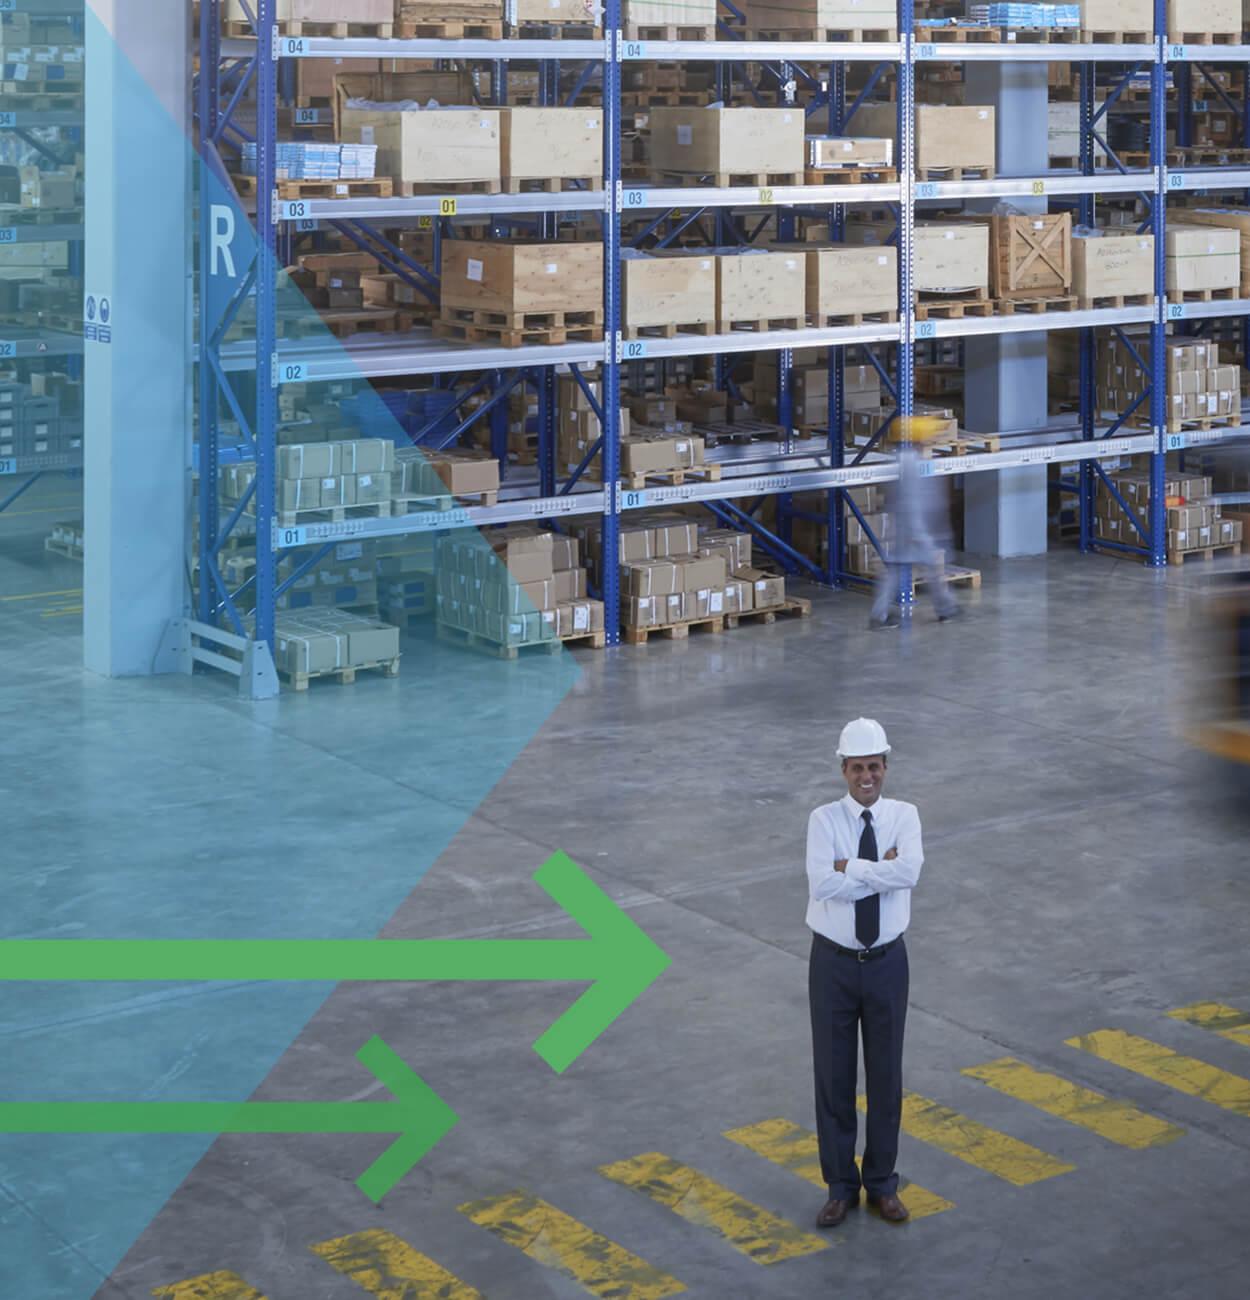 3PL Warehouse Management System